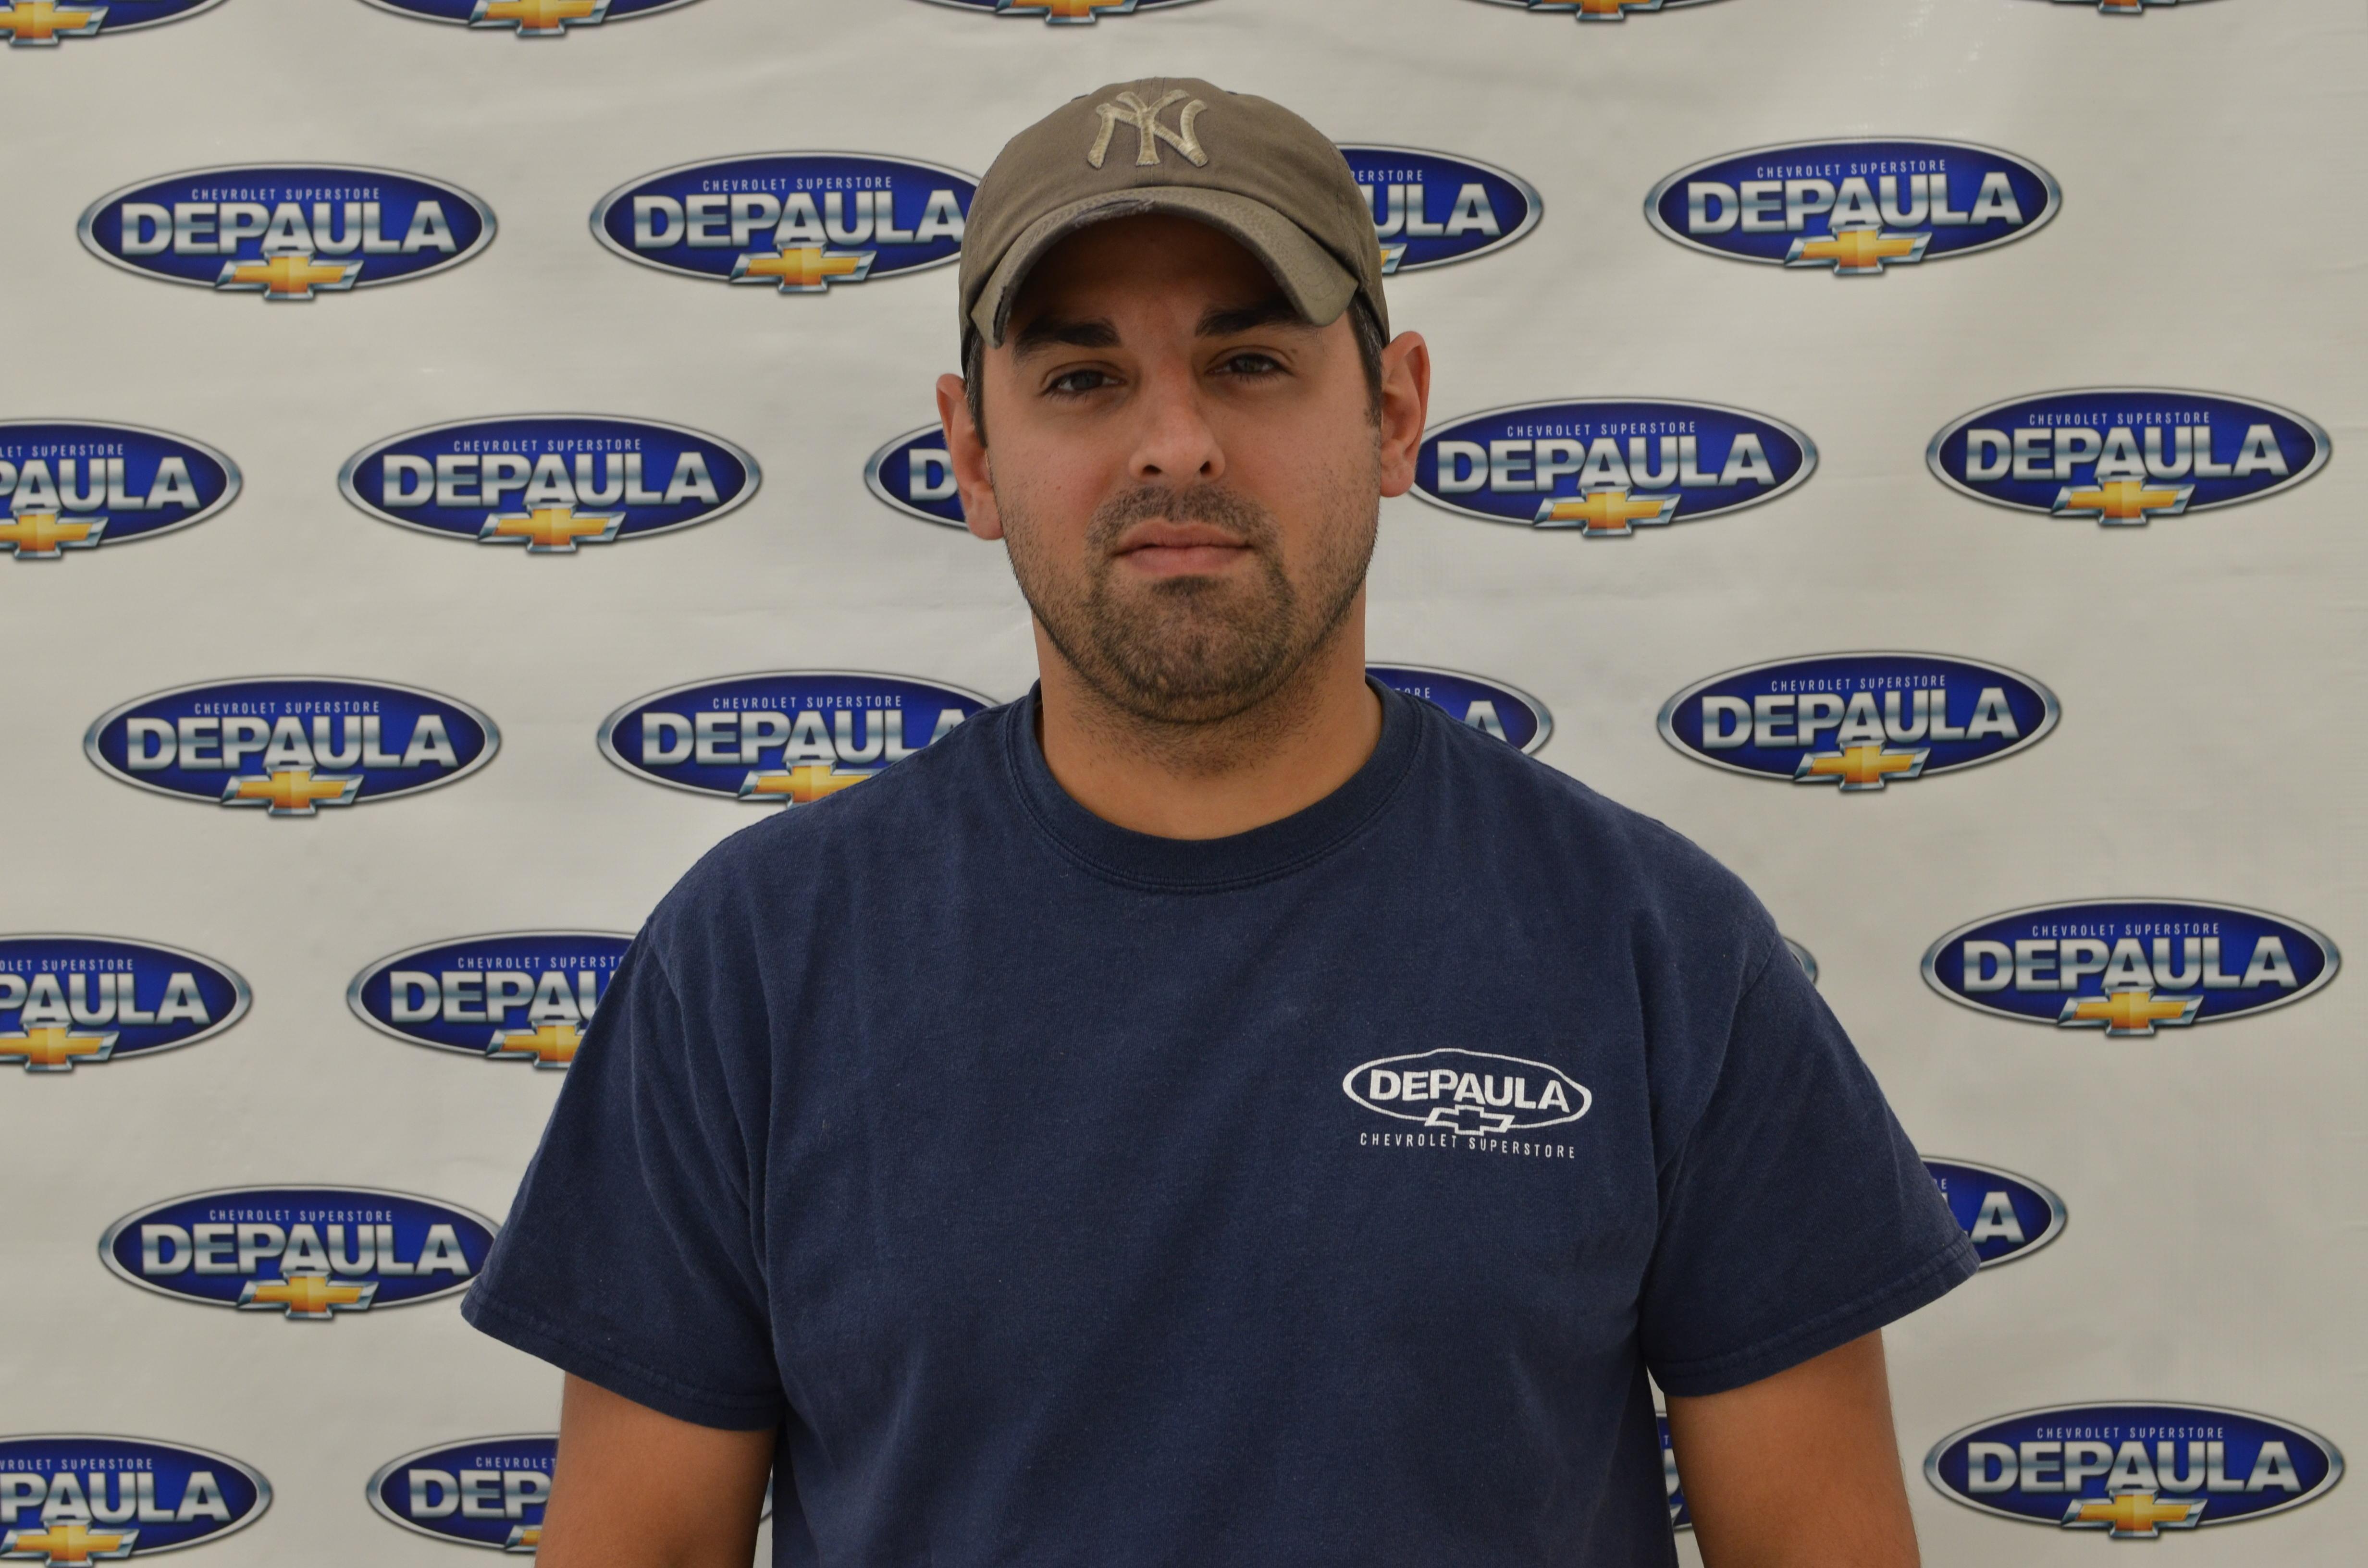 Steve Luciano